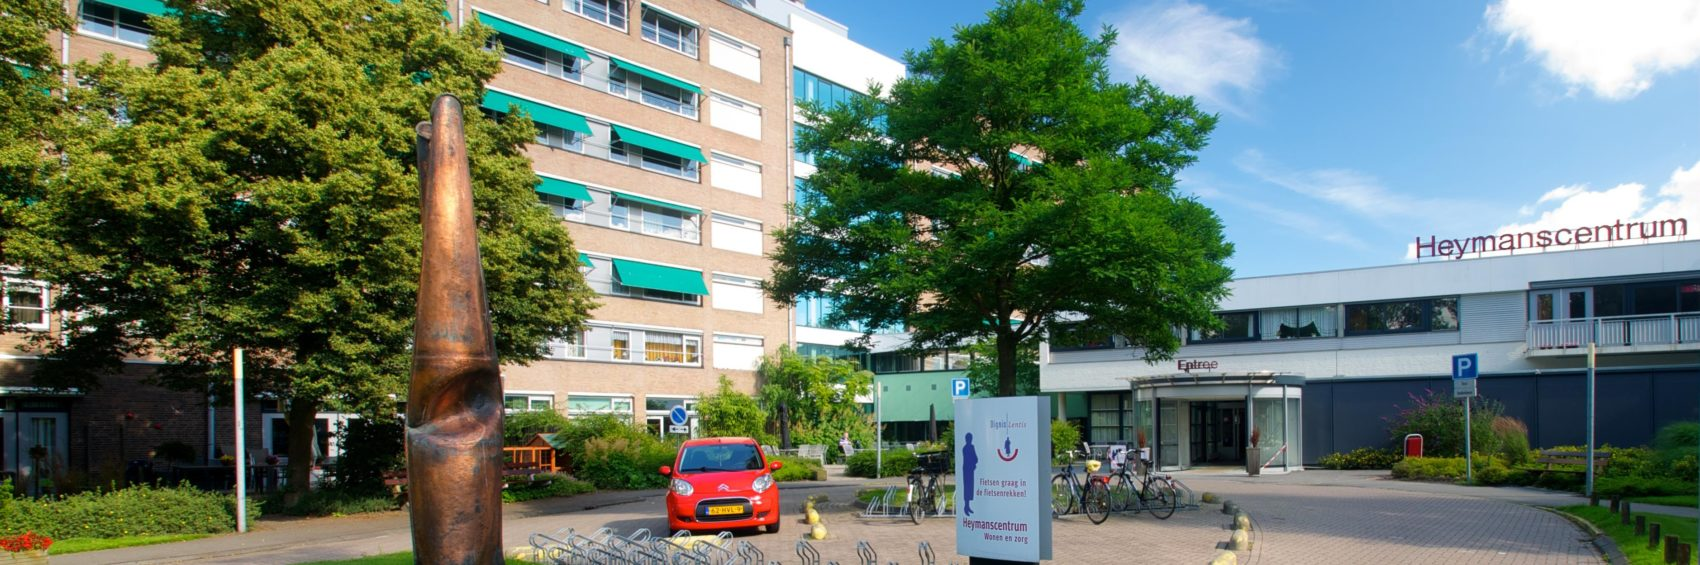 Heymanscentrum in Groningen, volledig afgekocht